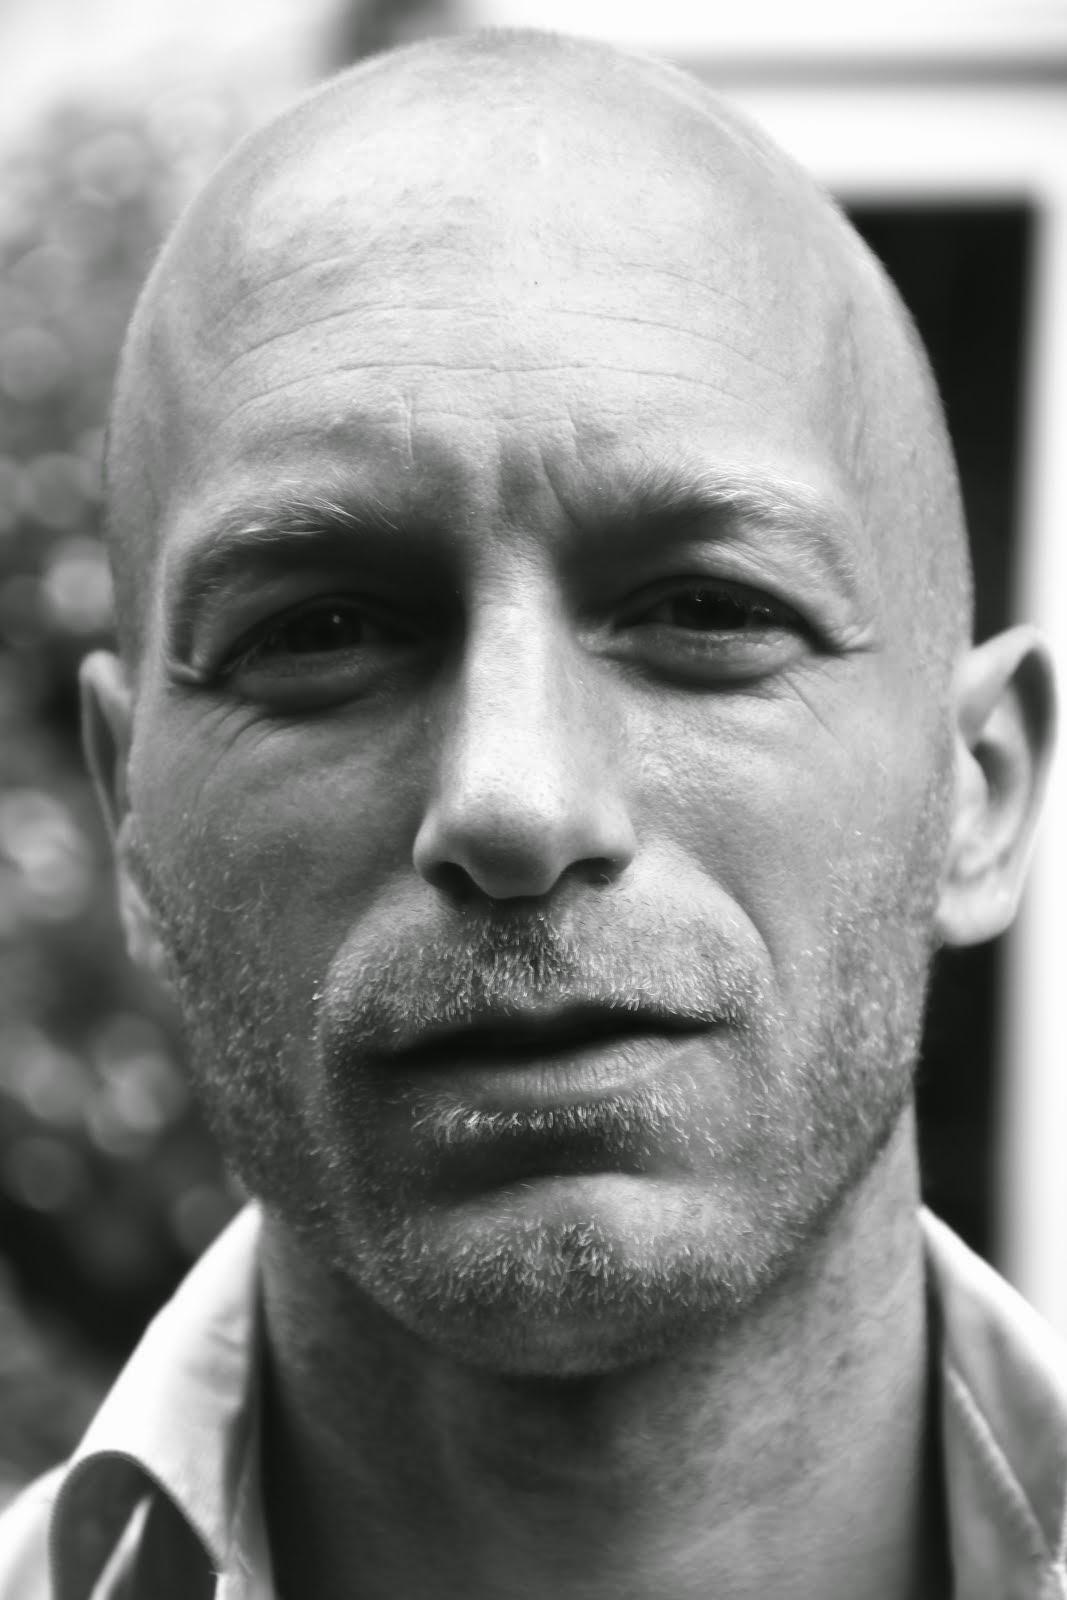 Joep Cornelissen